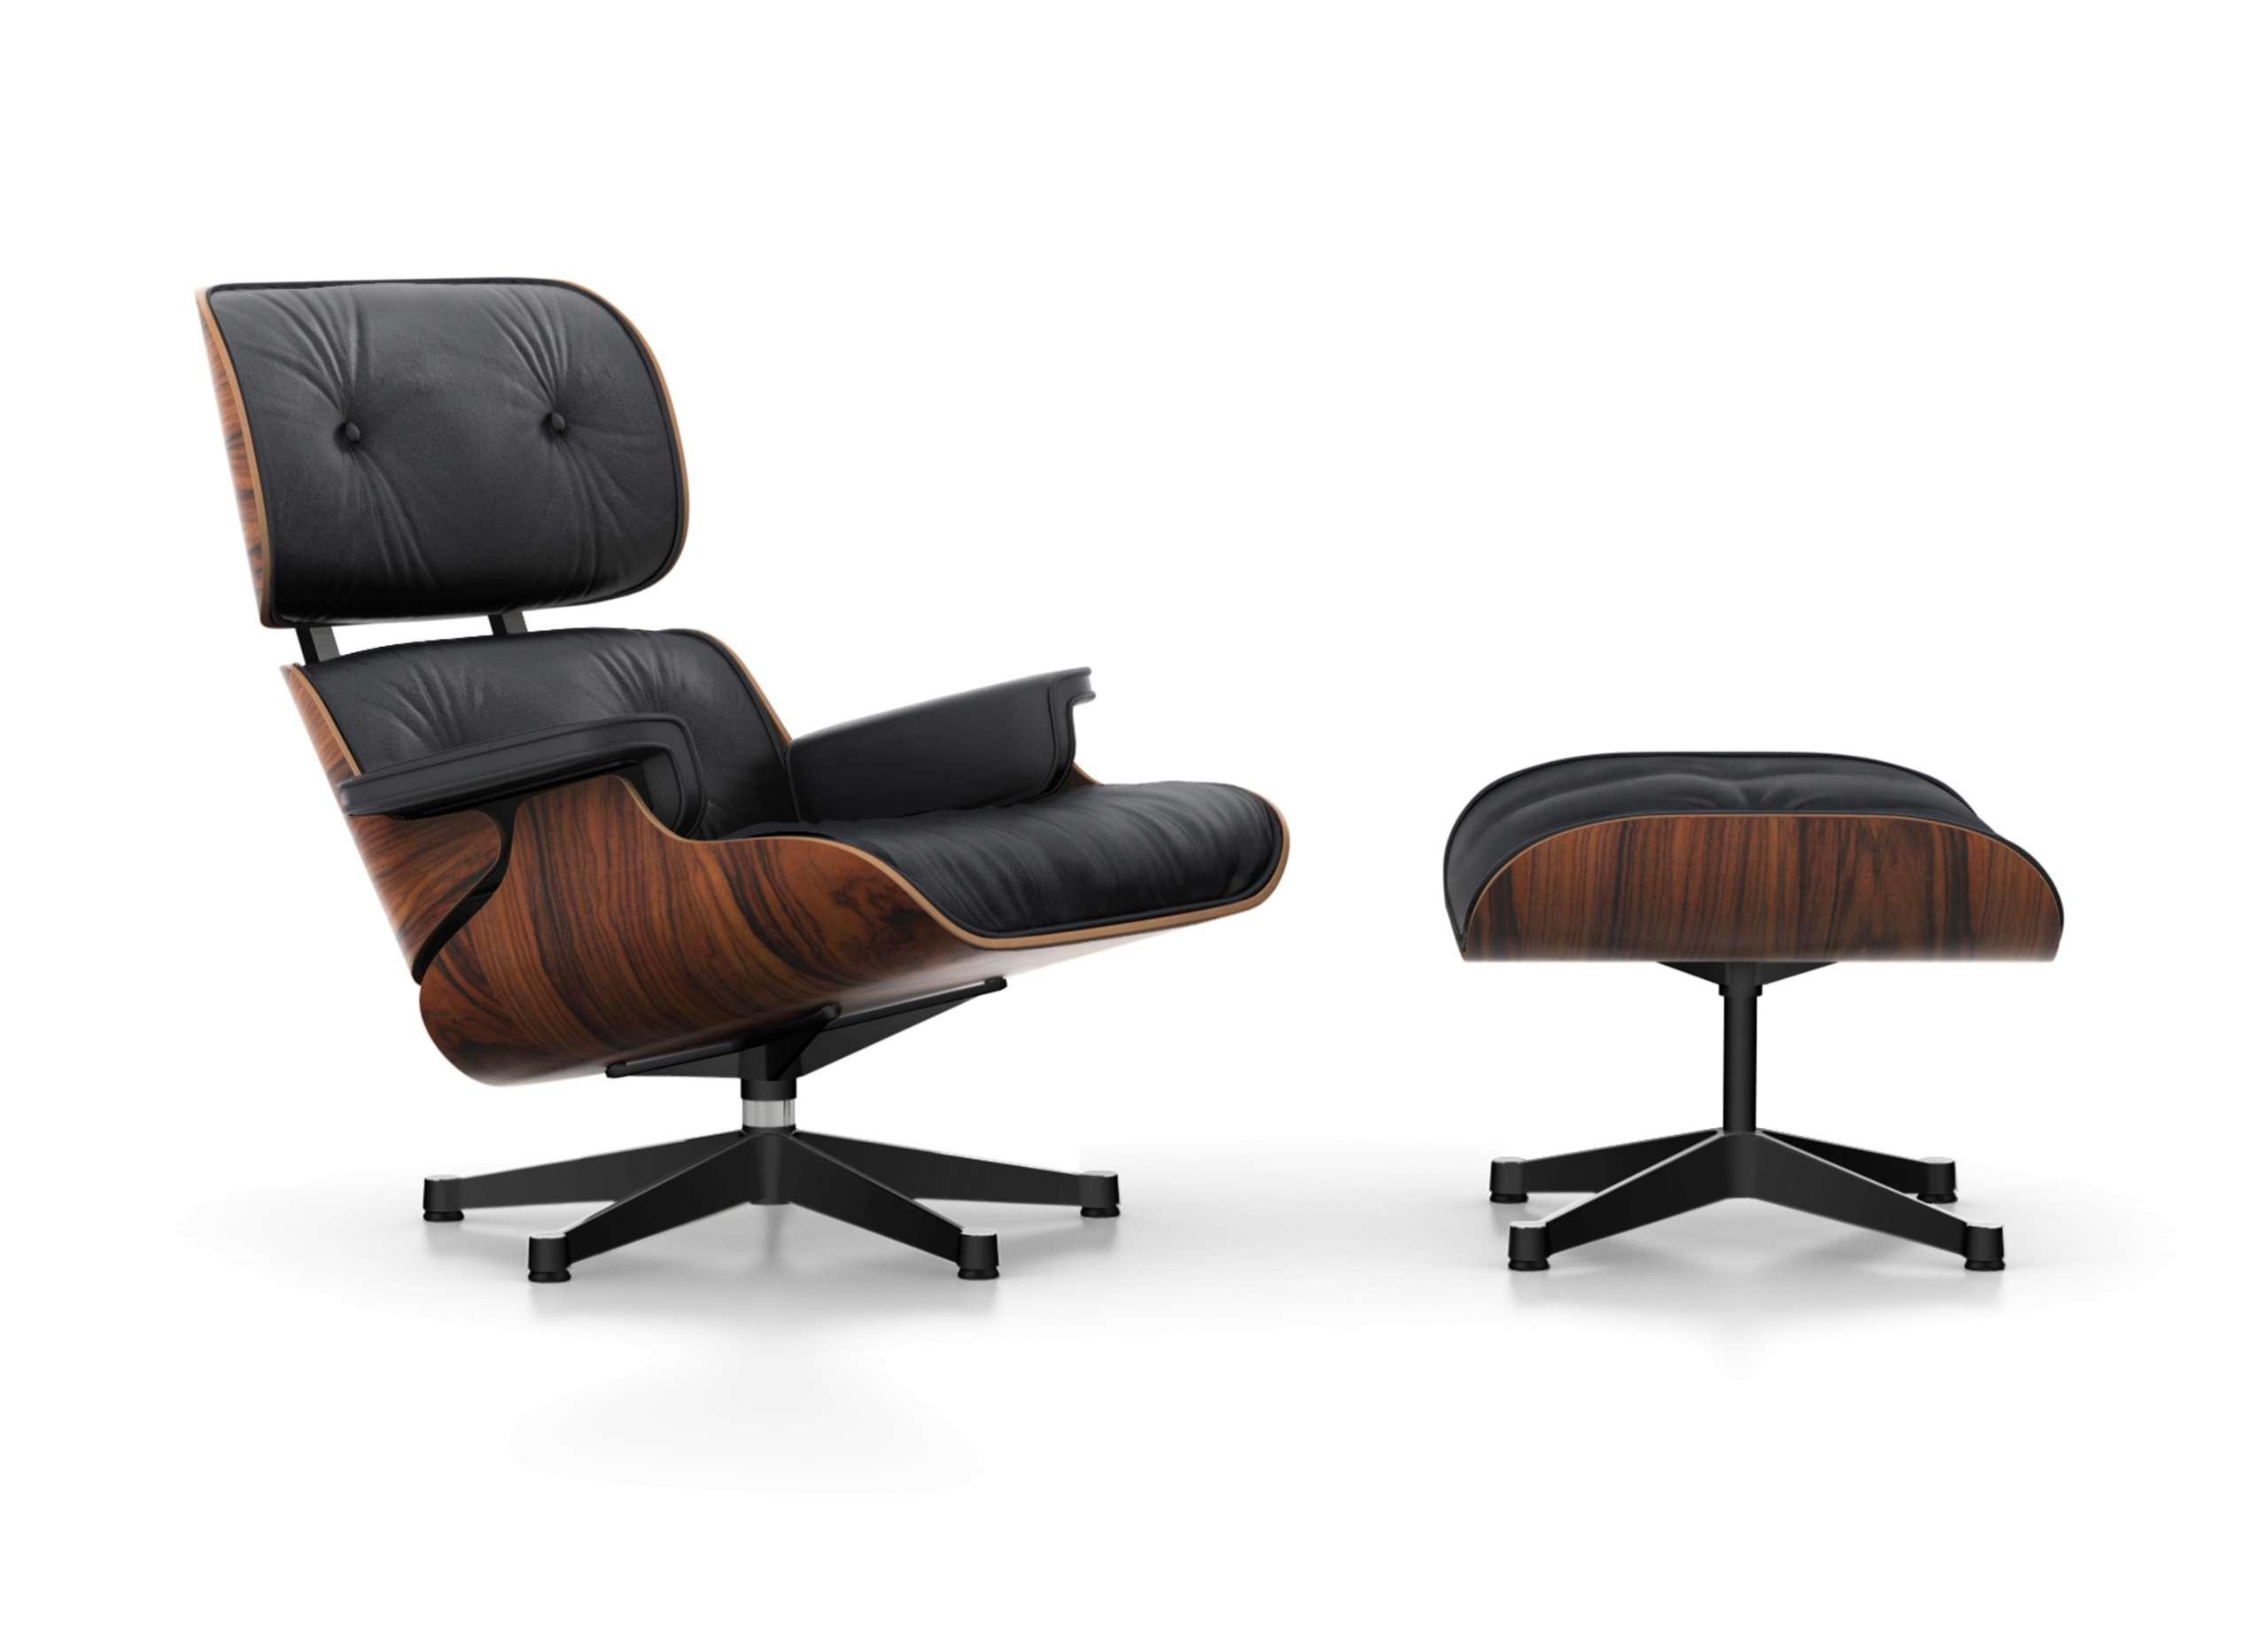 Eames Lounge Chair Und Ottoman